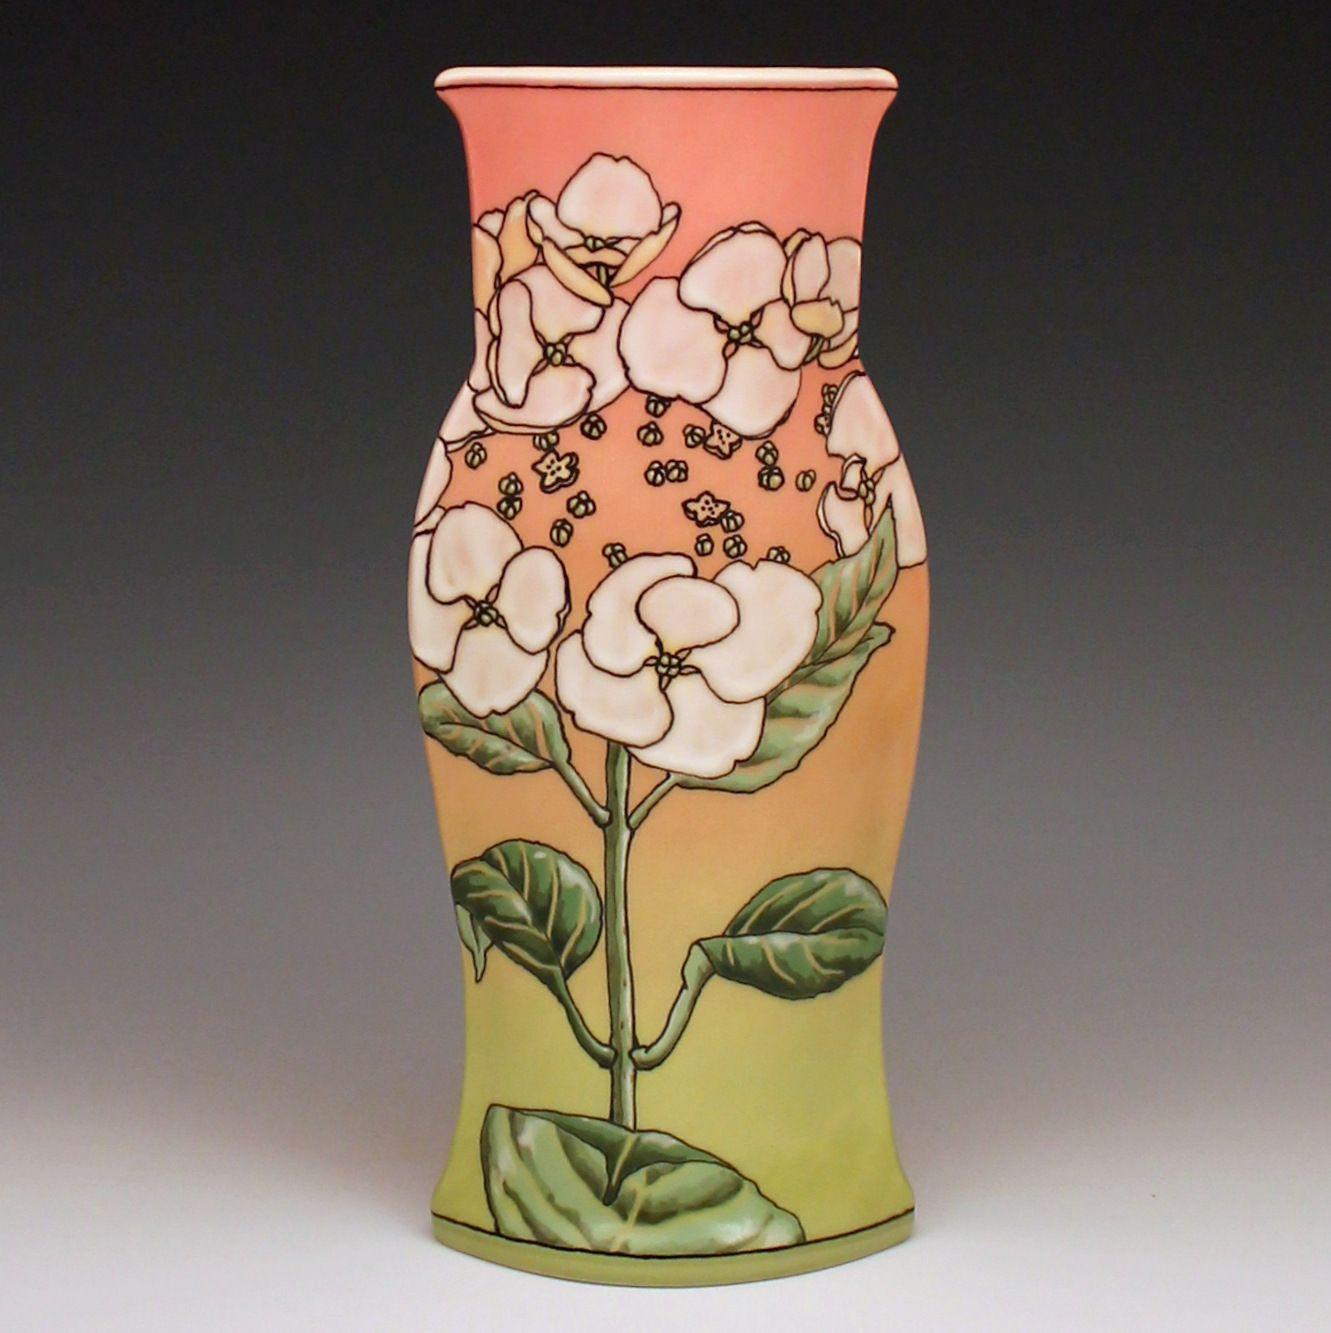 roman vase for sale of hydrangea vase by sarah gregory work pinterest hydrangea with hydrangea vase by sarah gregory